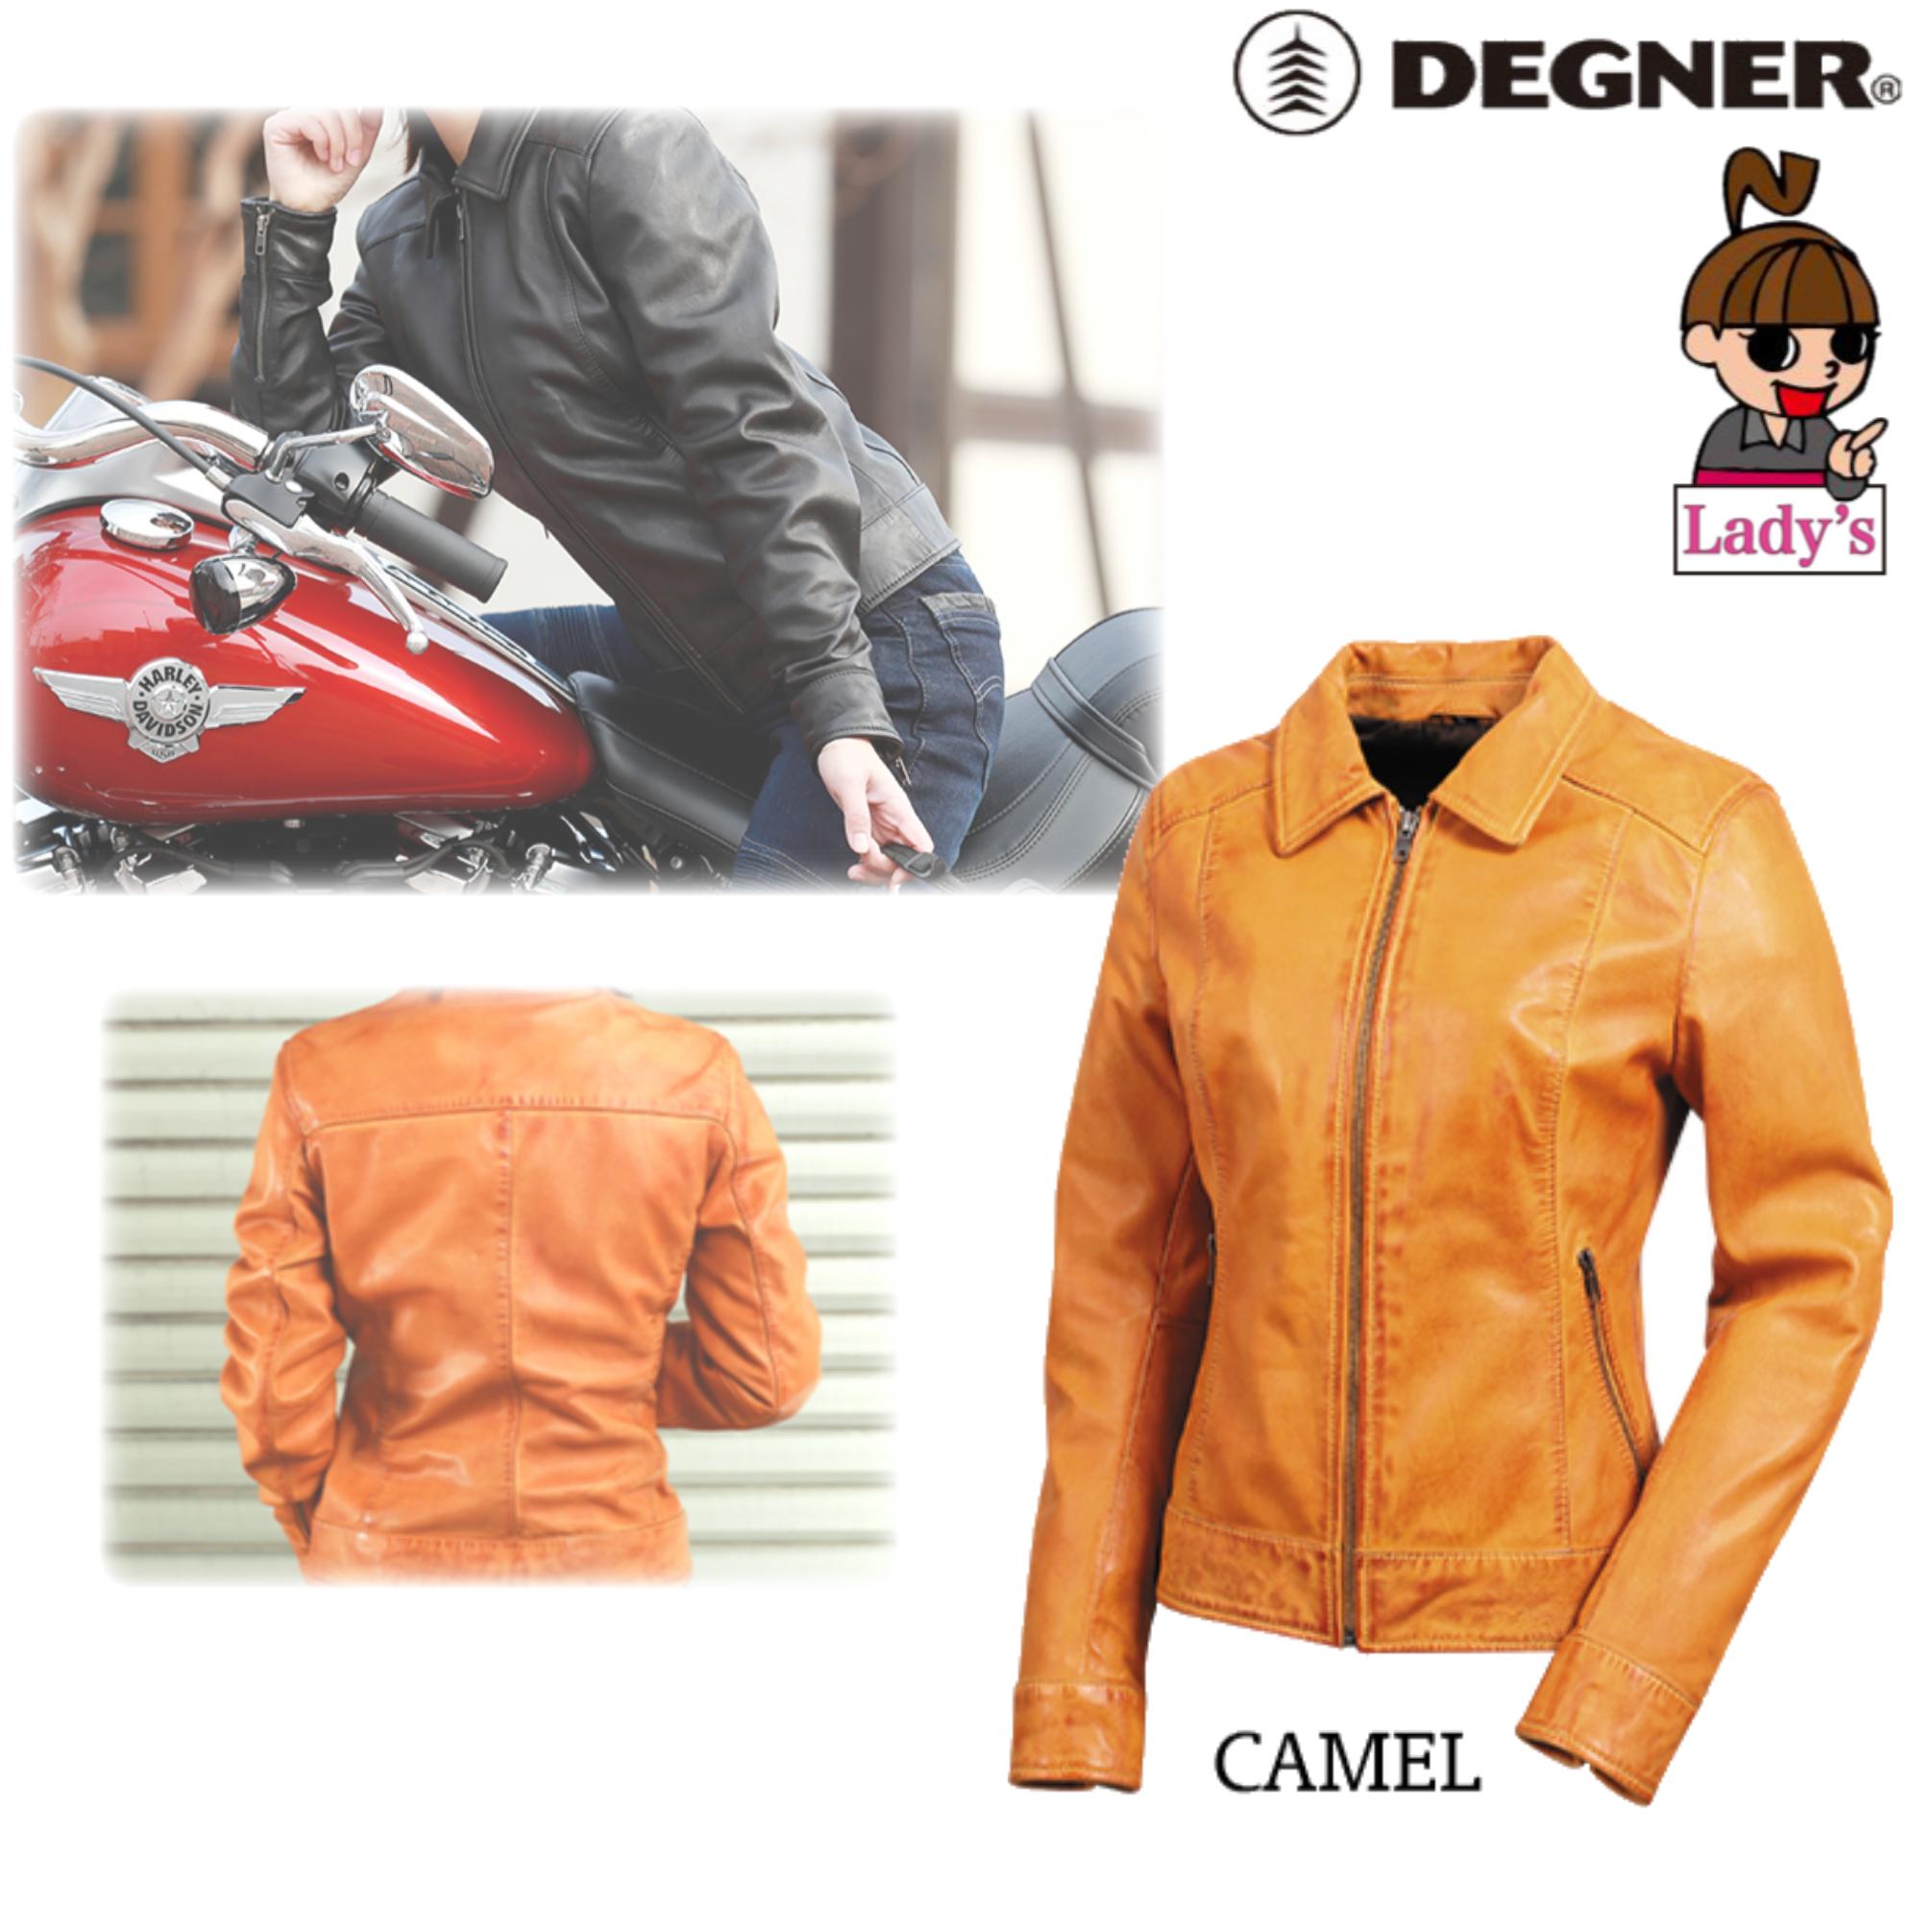 DEGNER (レディース)FR20SJ-11 レザージャケット キャメル◆全2色◆